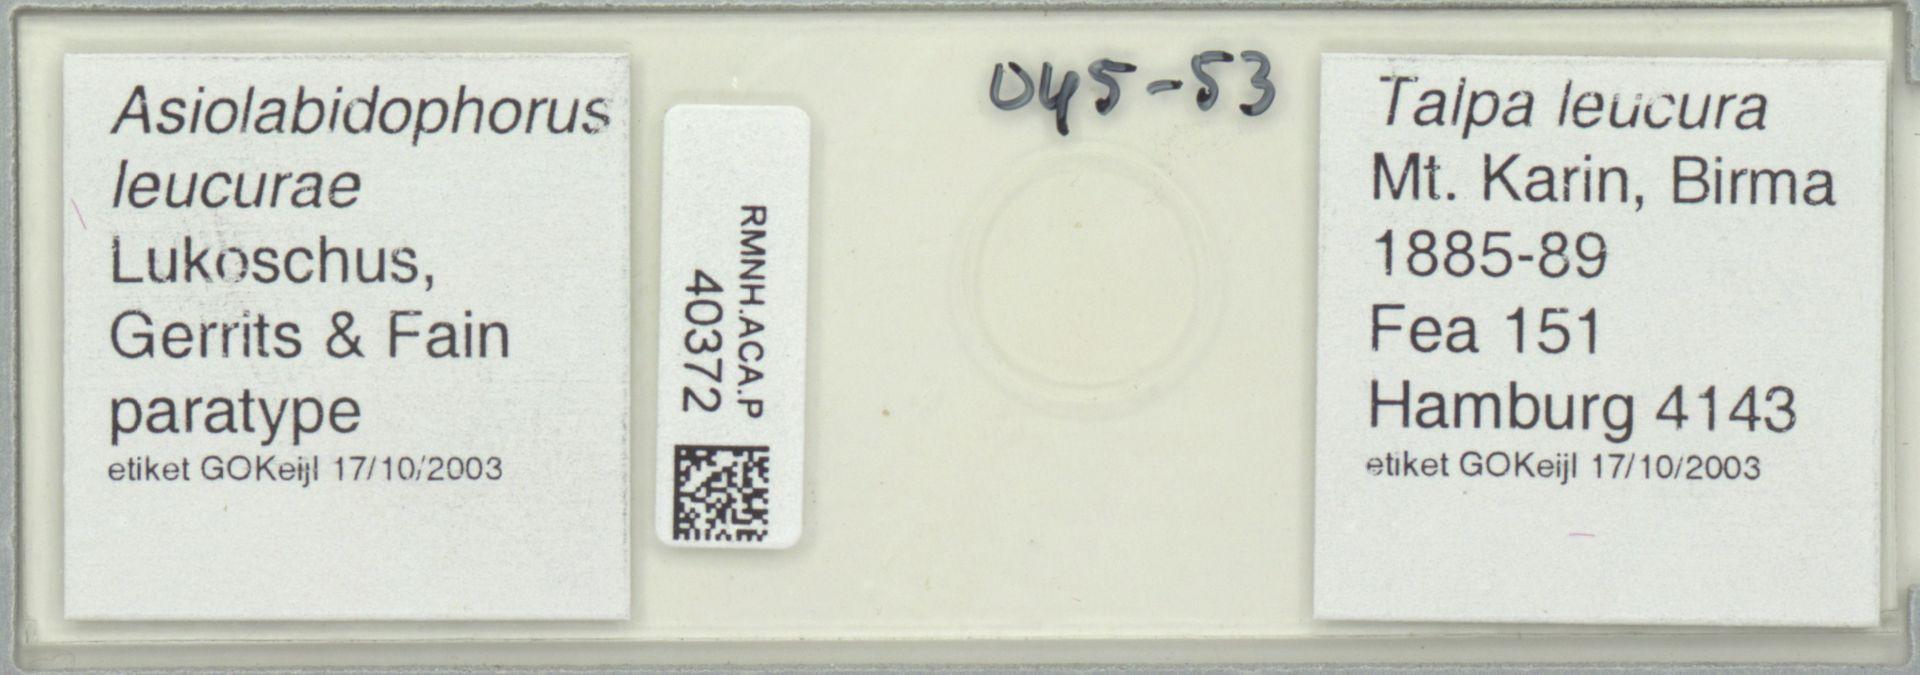 RMNH.ACA.P.40372 | Asiolabidophorus leucurae Lukoschus, Gerrits & Fain